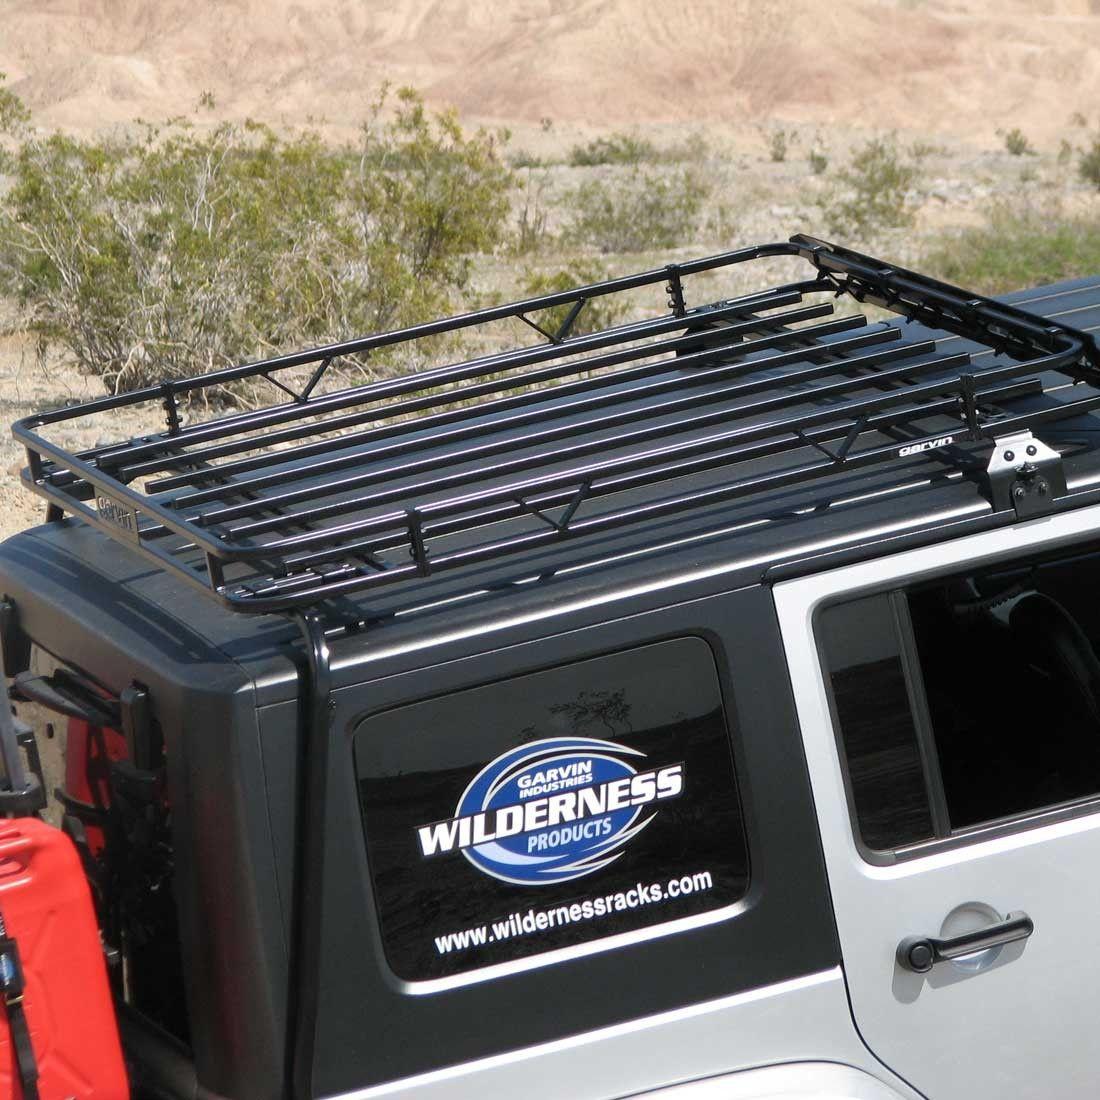 Hard Top Specialty Rack 07 15 Jku Wrangler Hard Top Jeep Wrangler Jeep Jeep Wrangler Unlimited